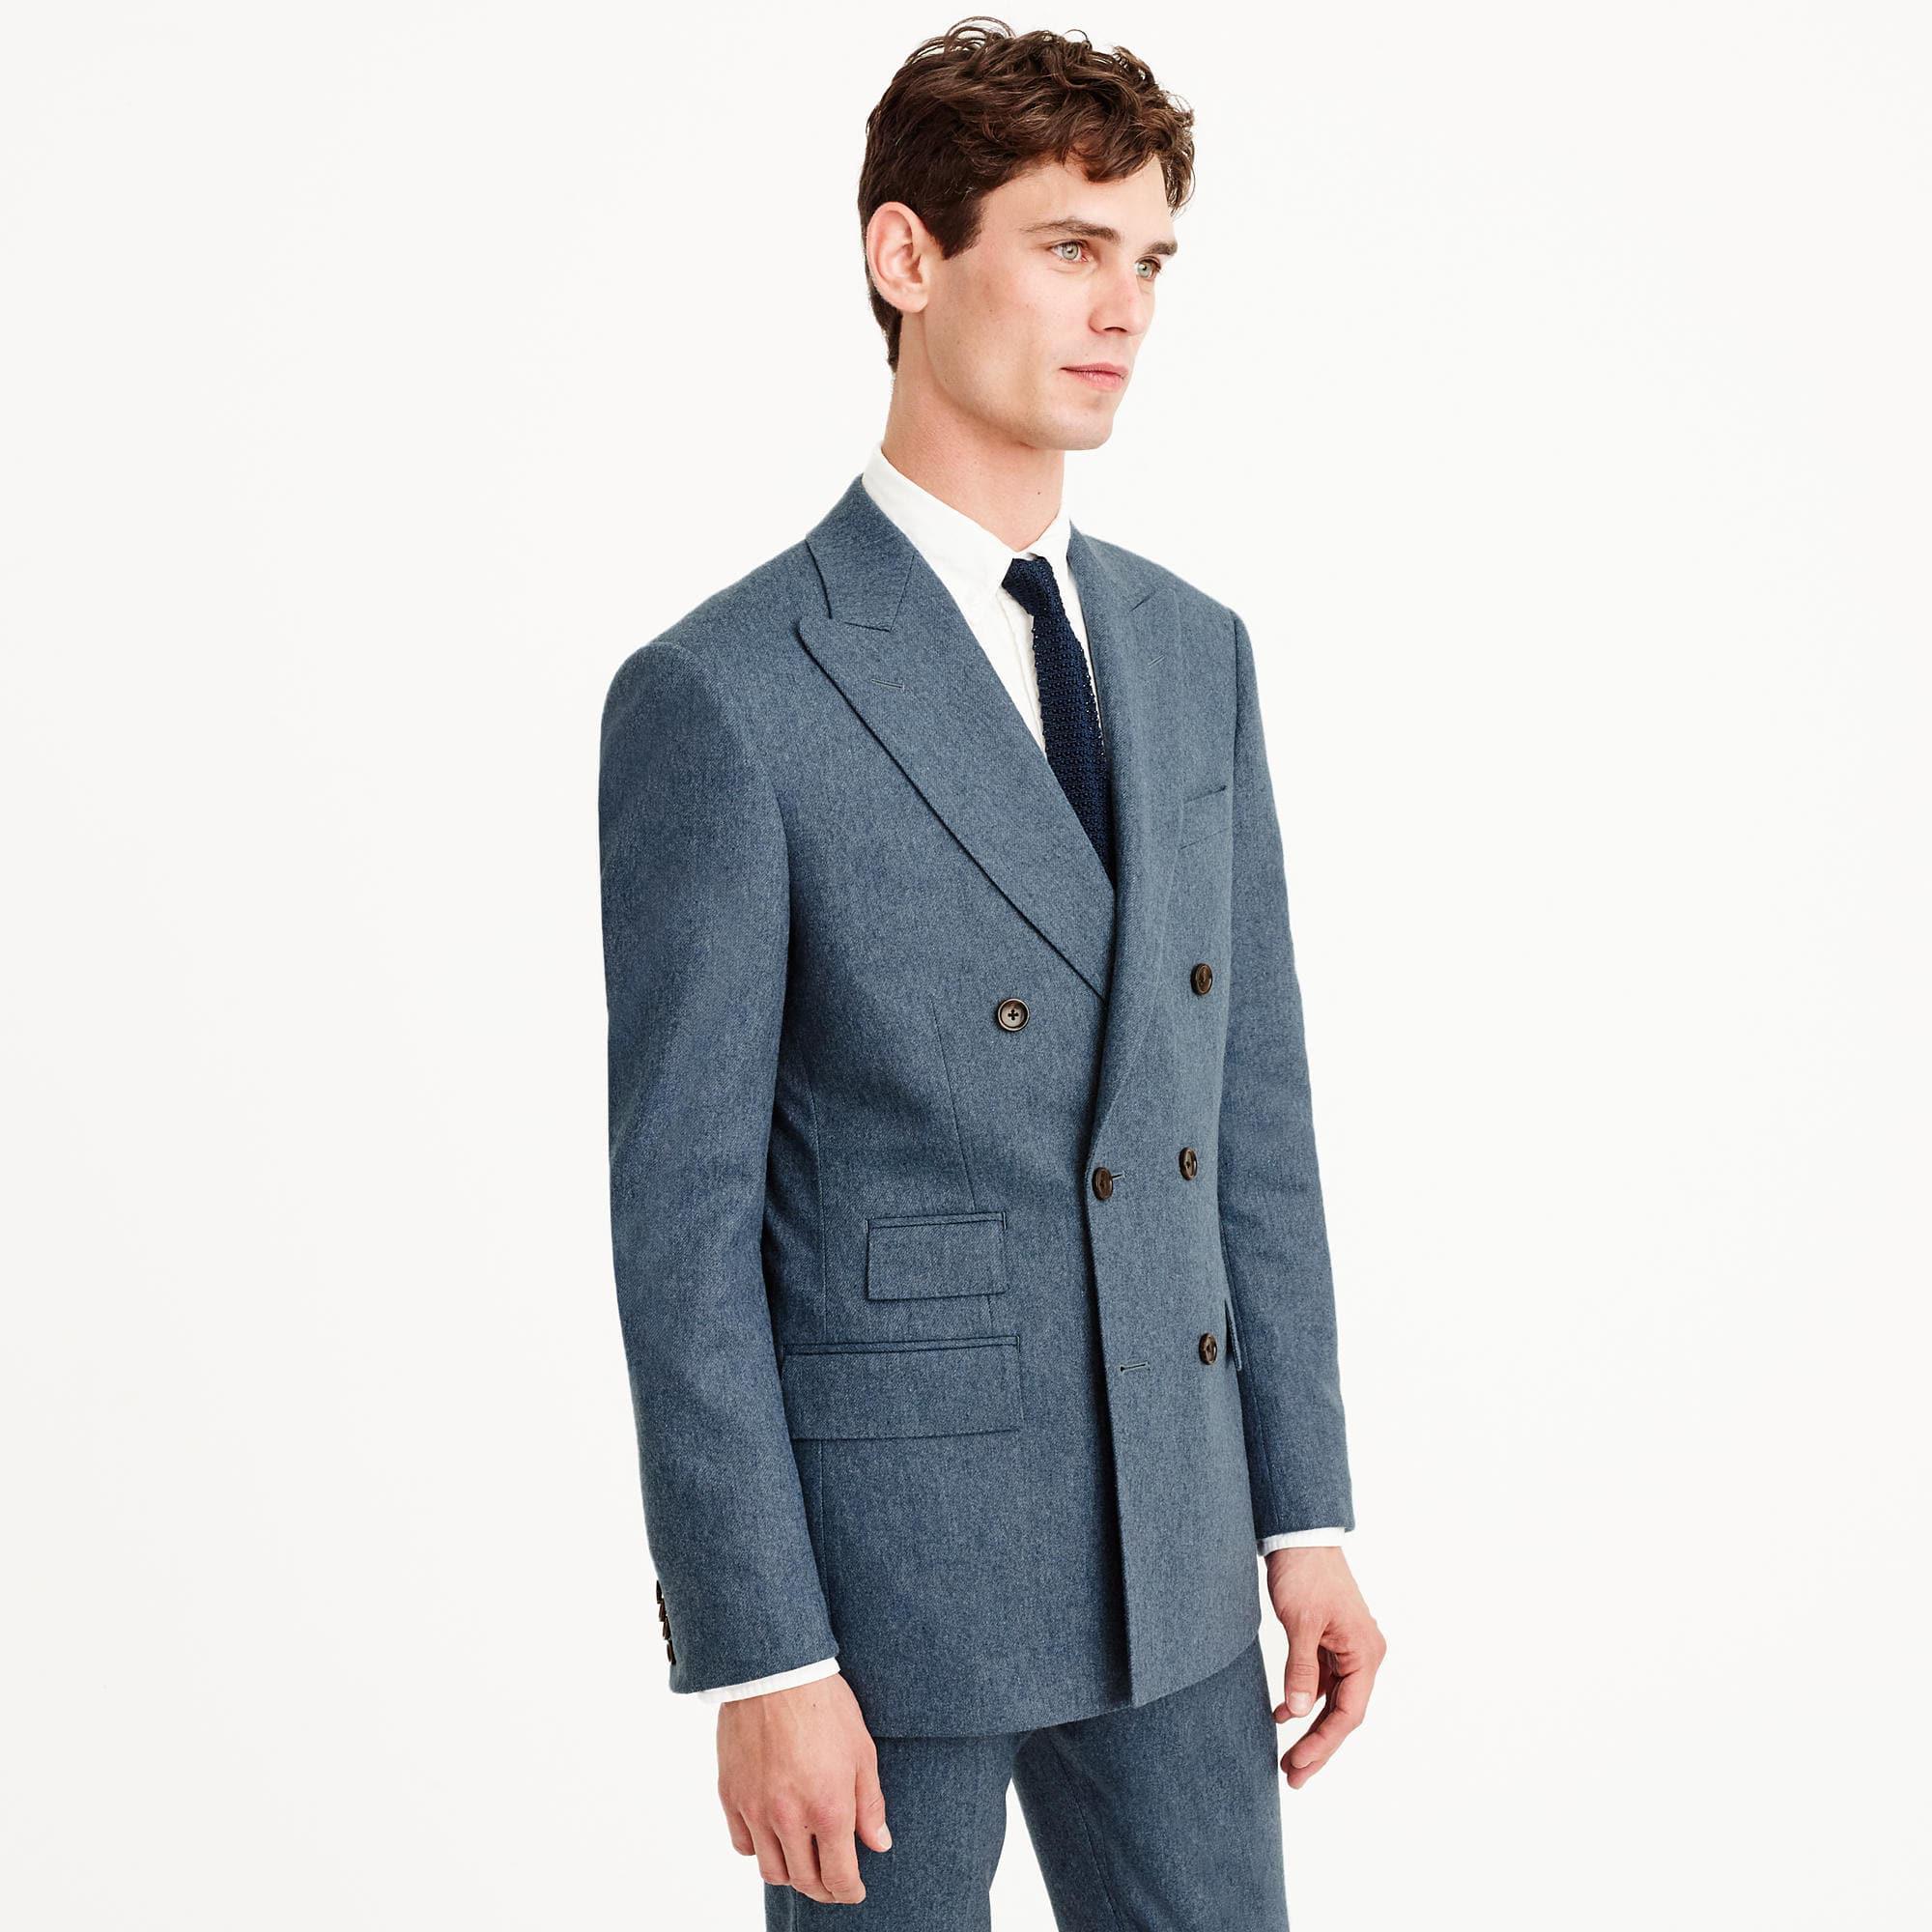 J.Crew Wool Paul Feig Peak-lapel Suit Jacket in Blue for Men